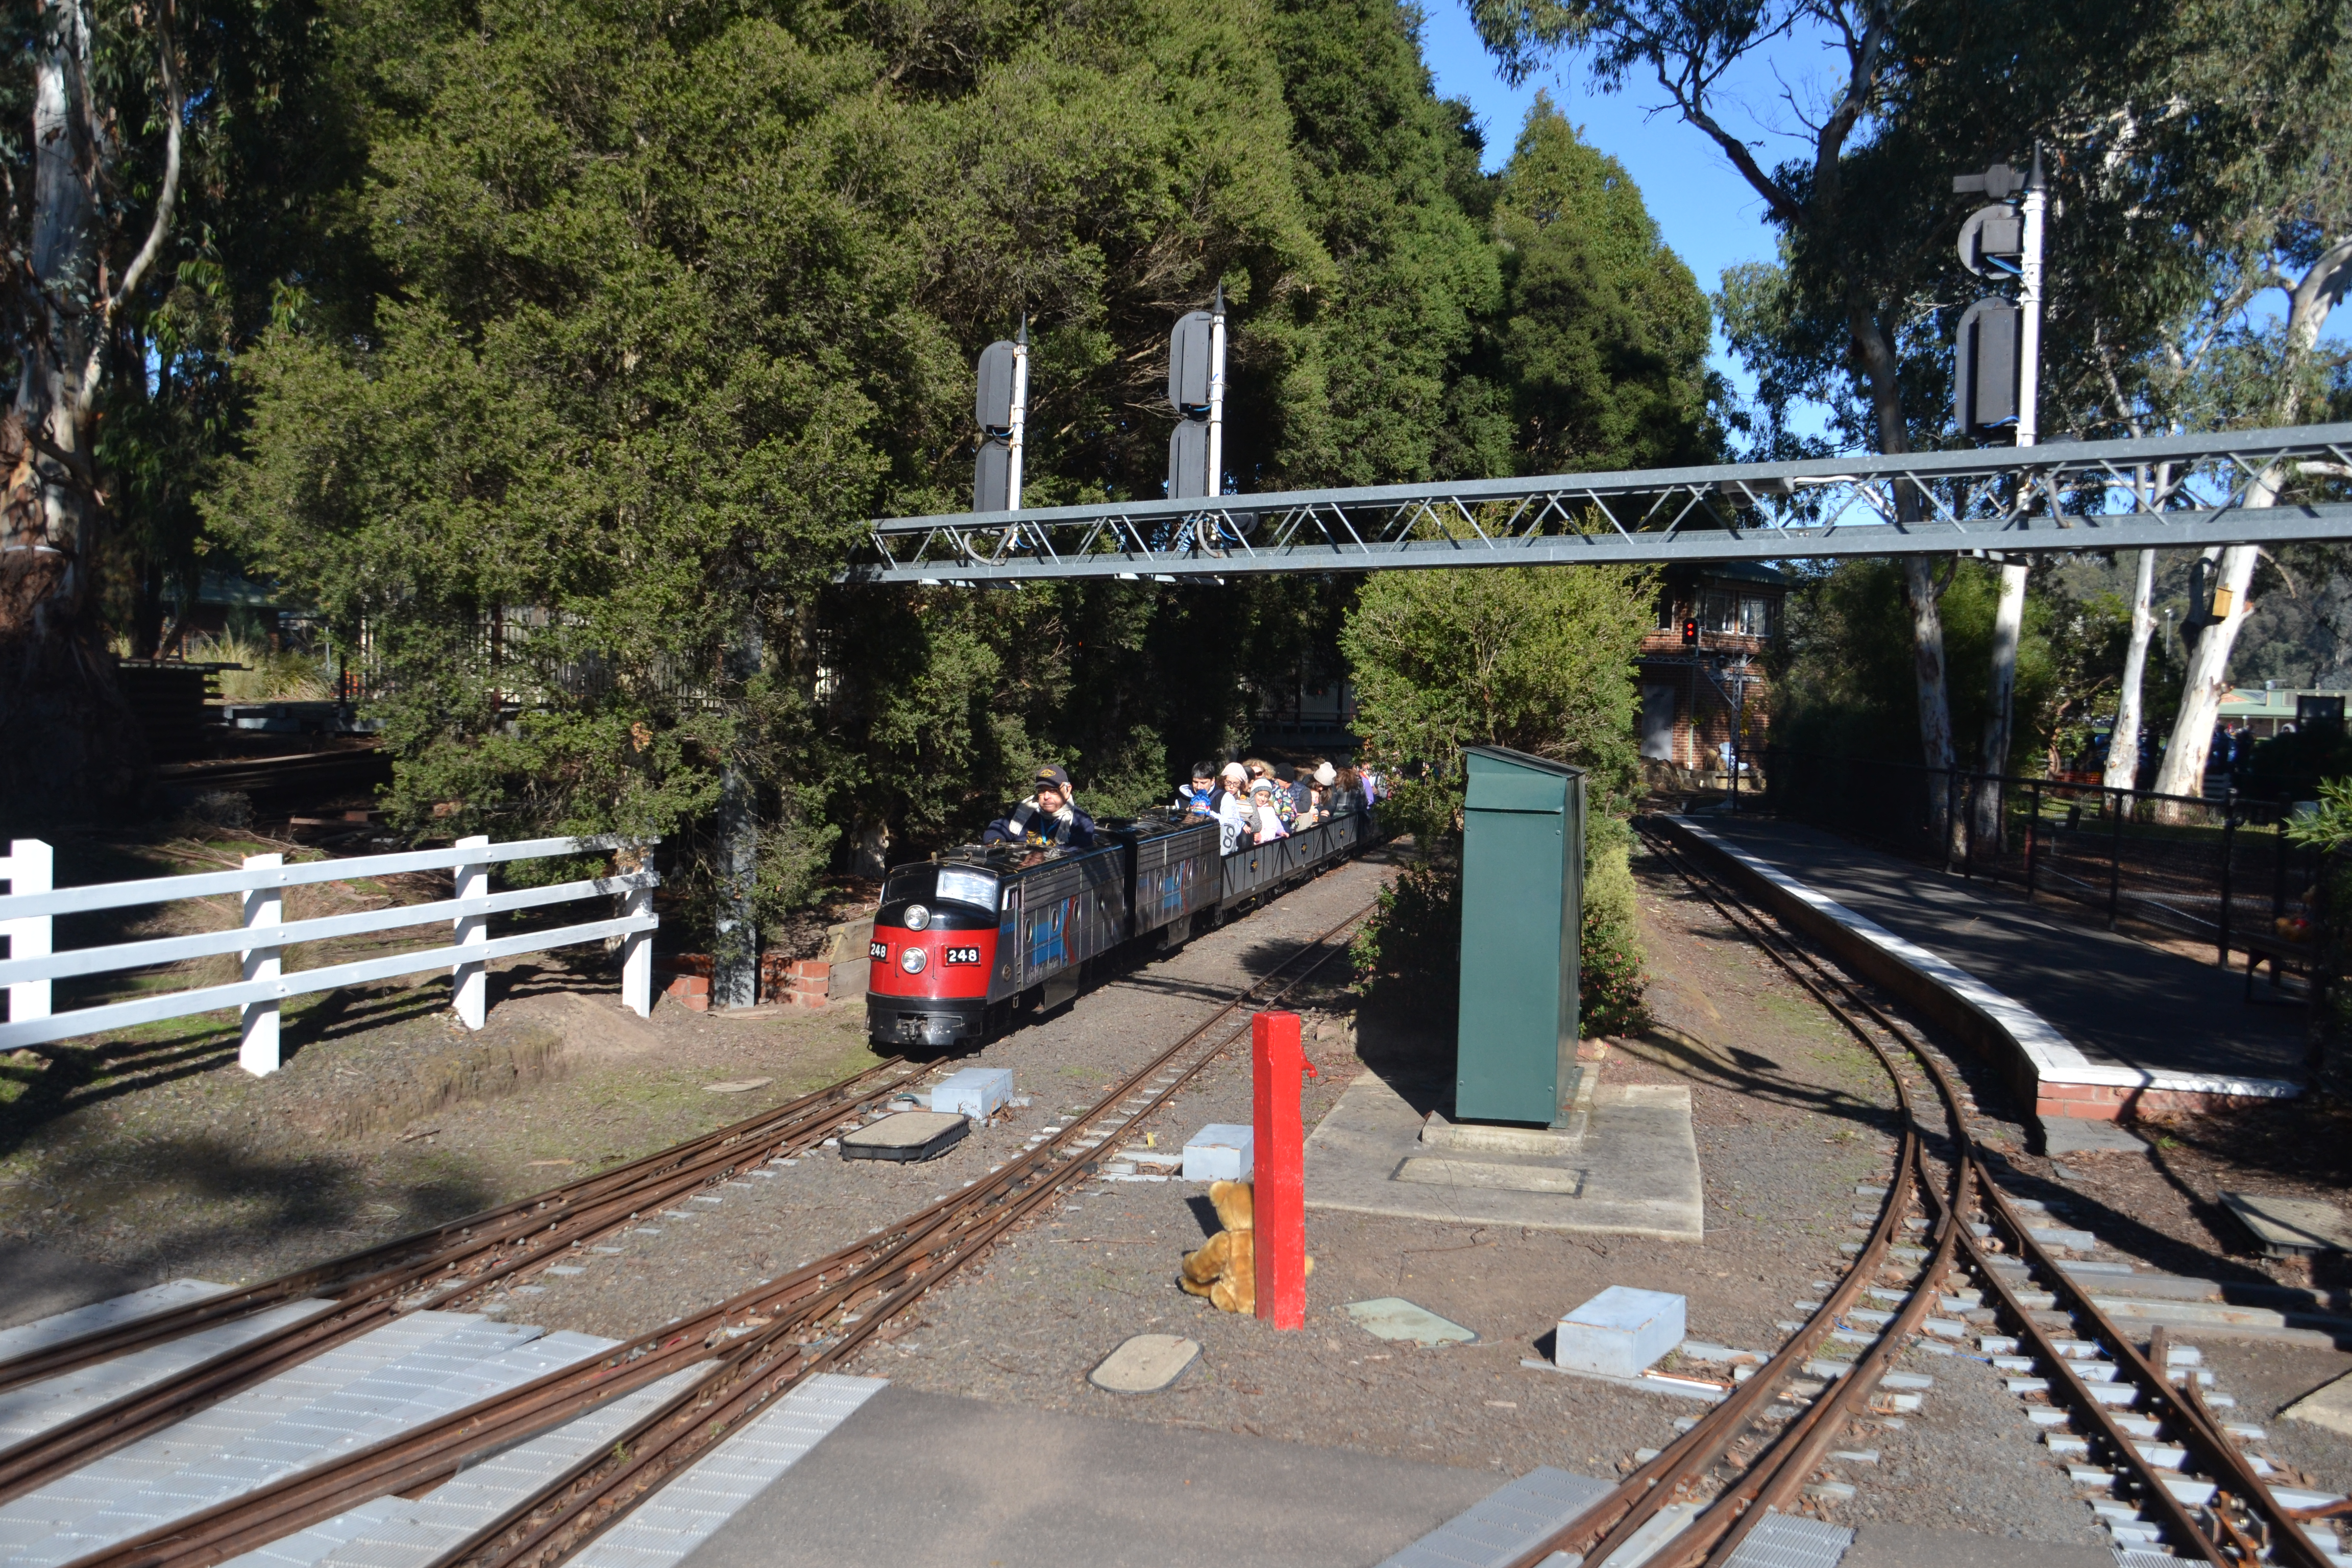 diamond-valley-miniature railway-eltham